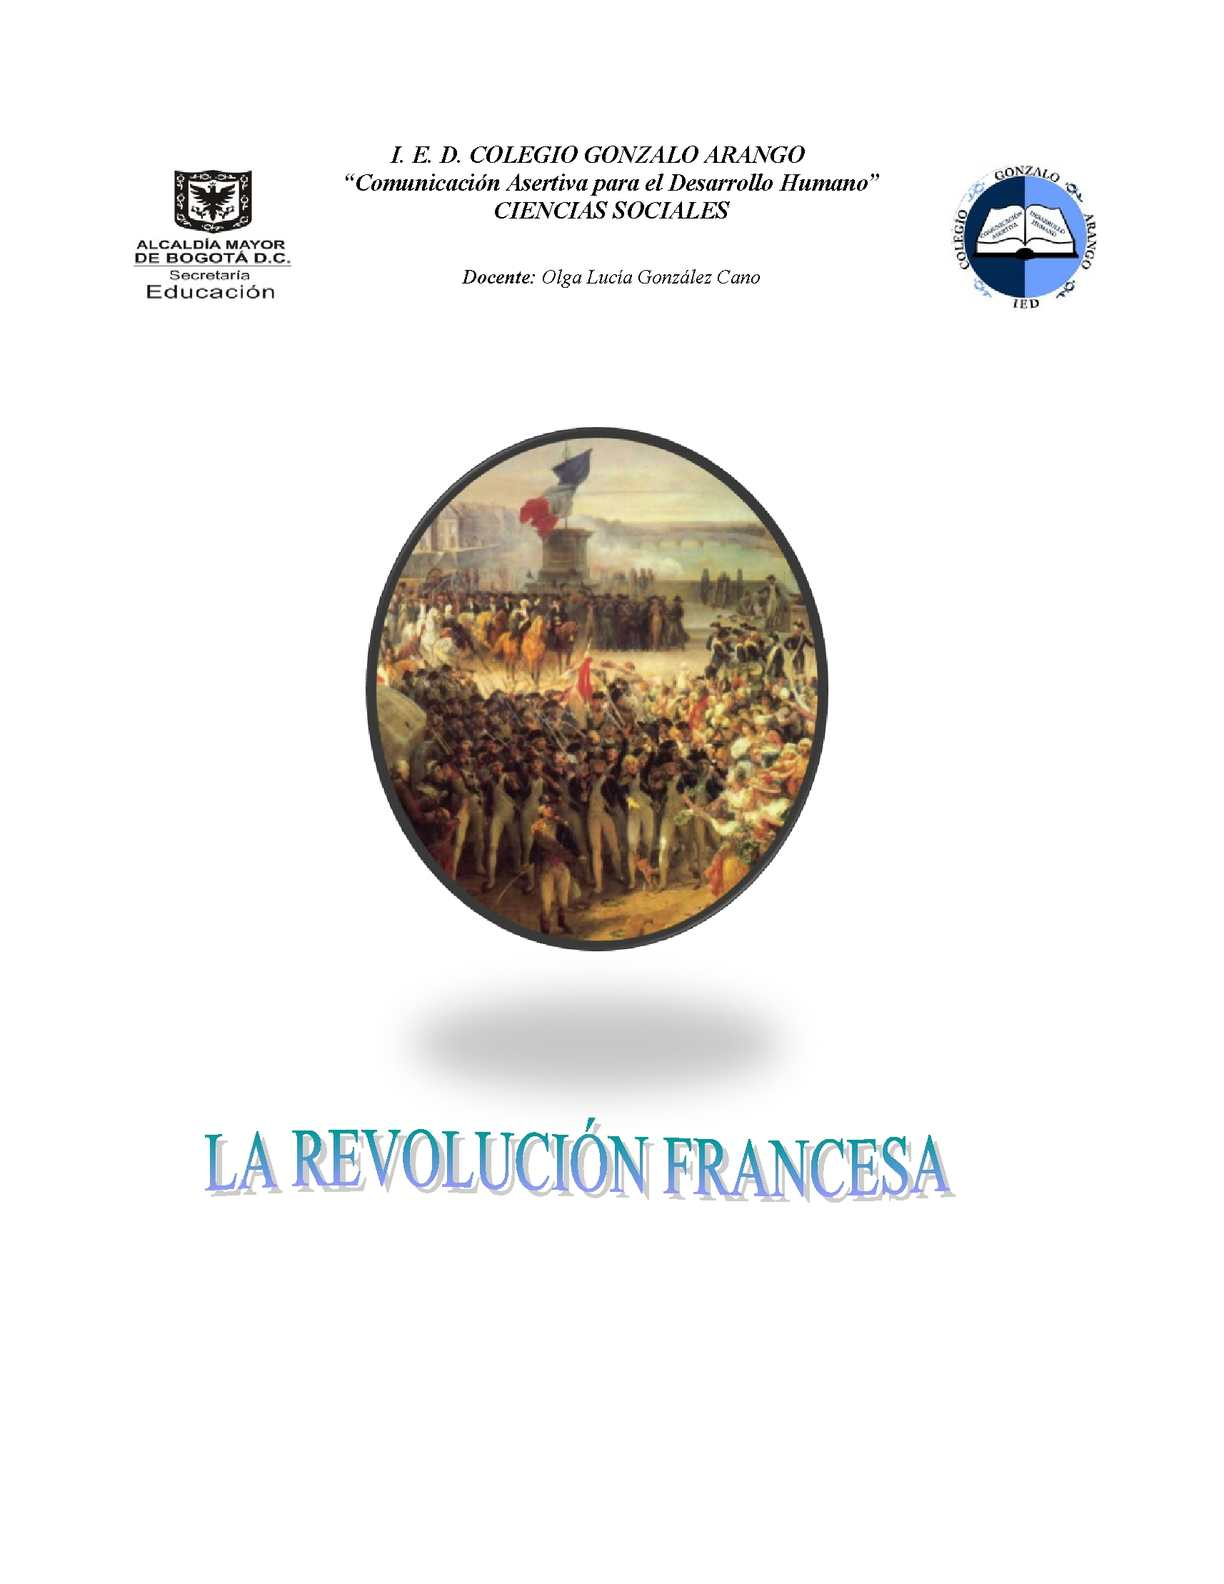 Taller Sociales La Revolución Francesa Version Calameo 1